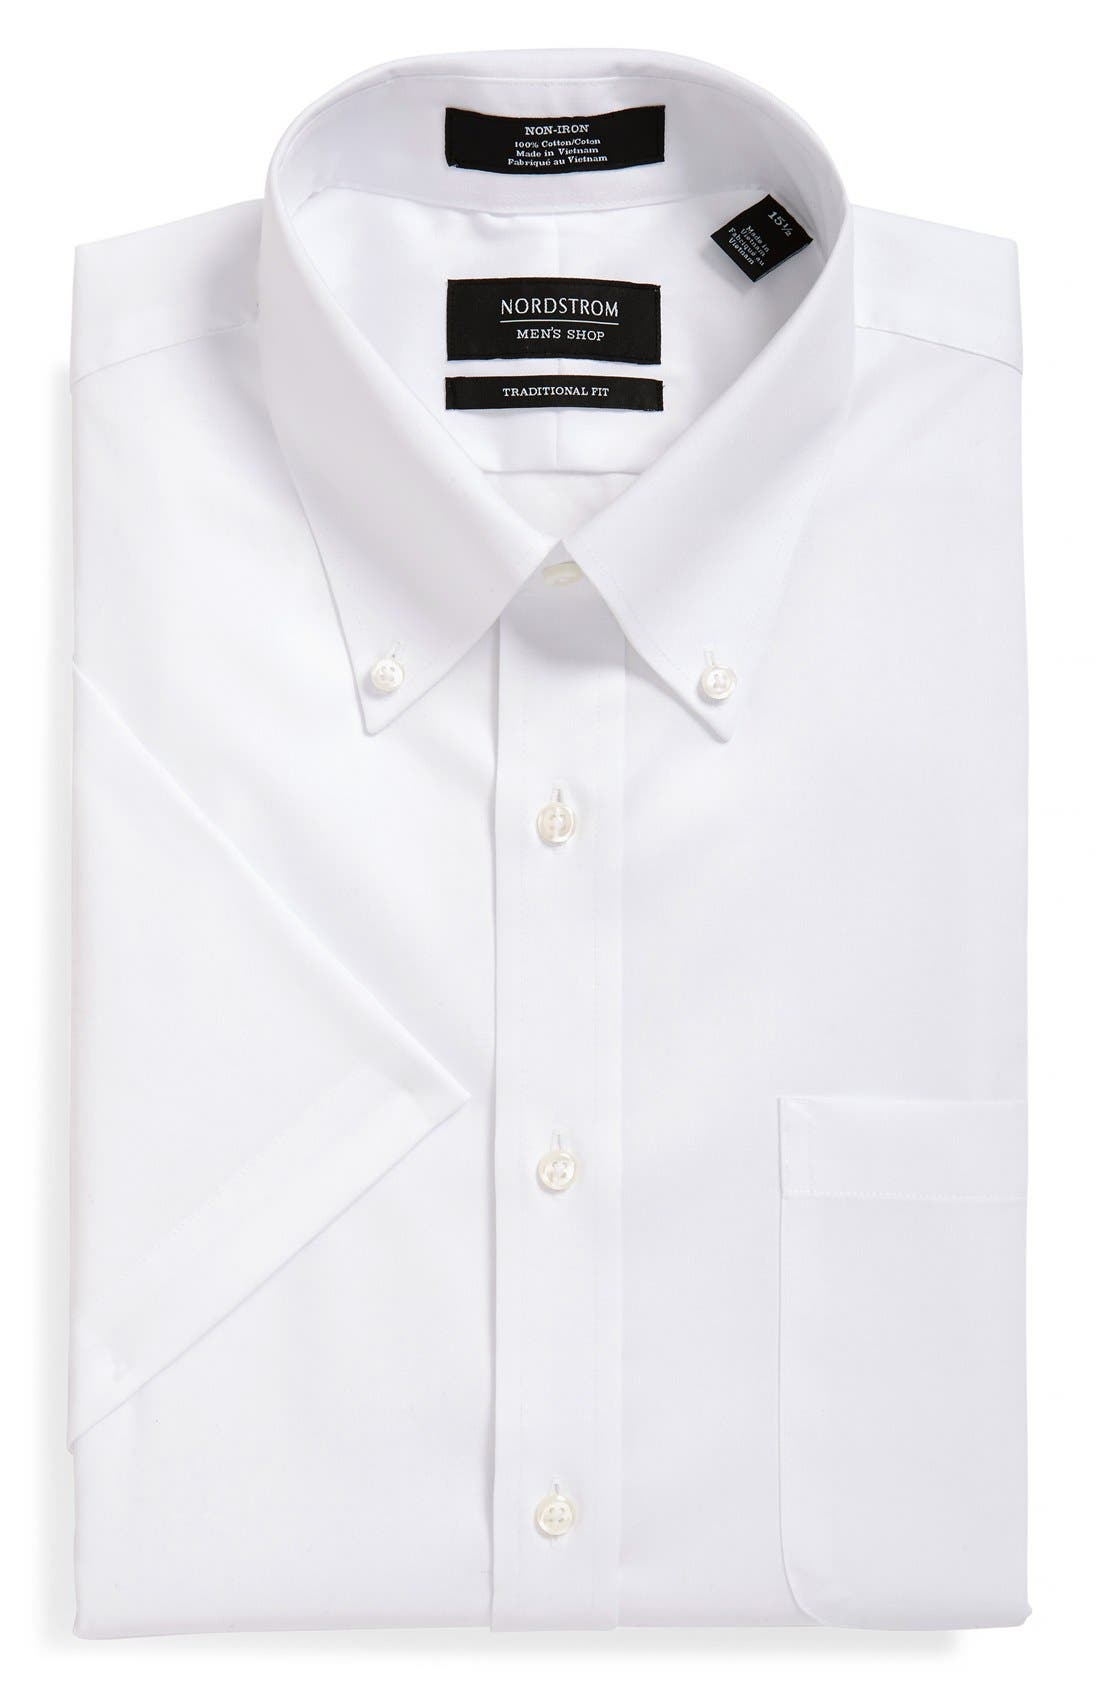 Nordstrom Men's Shop Traditional Fit Non-Iron Short Sleeve Dress Shirt